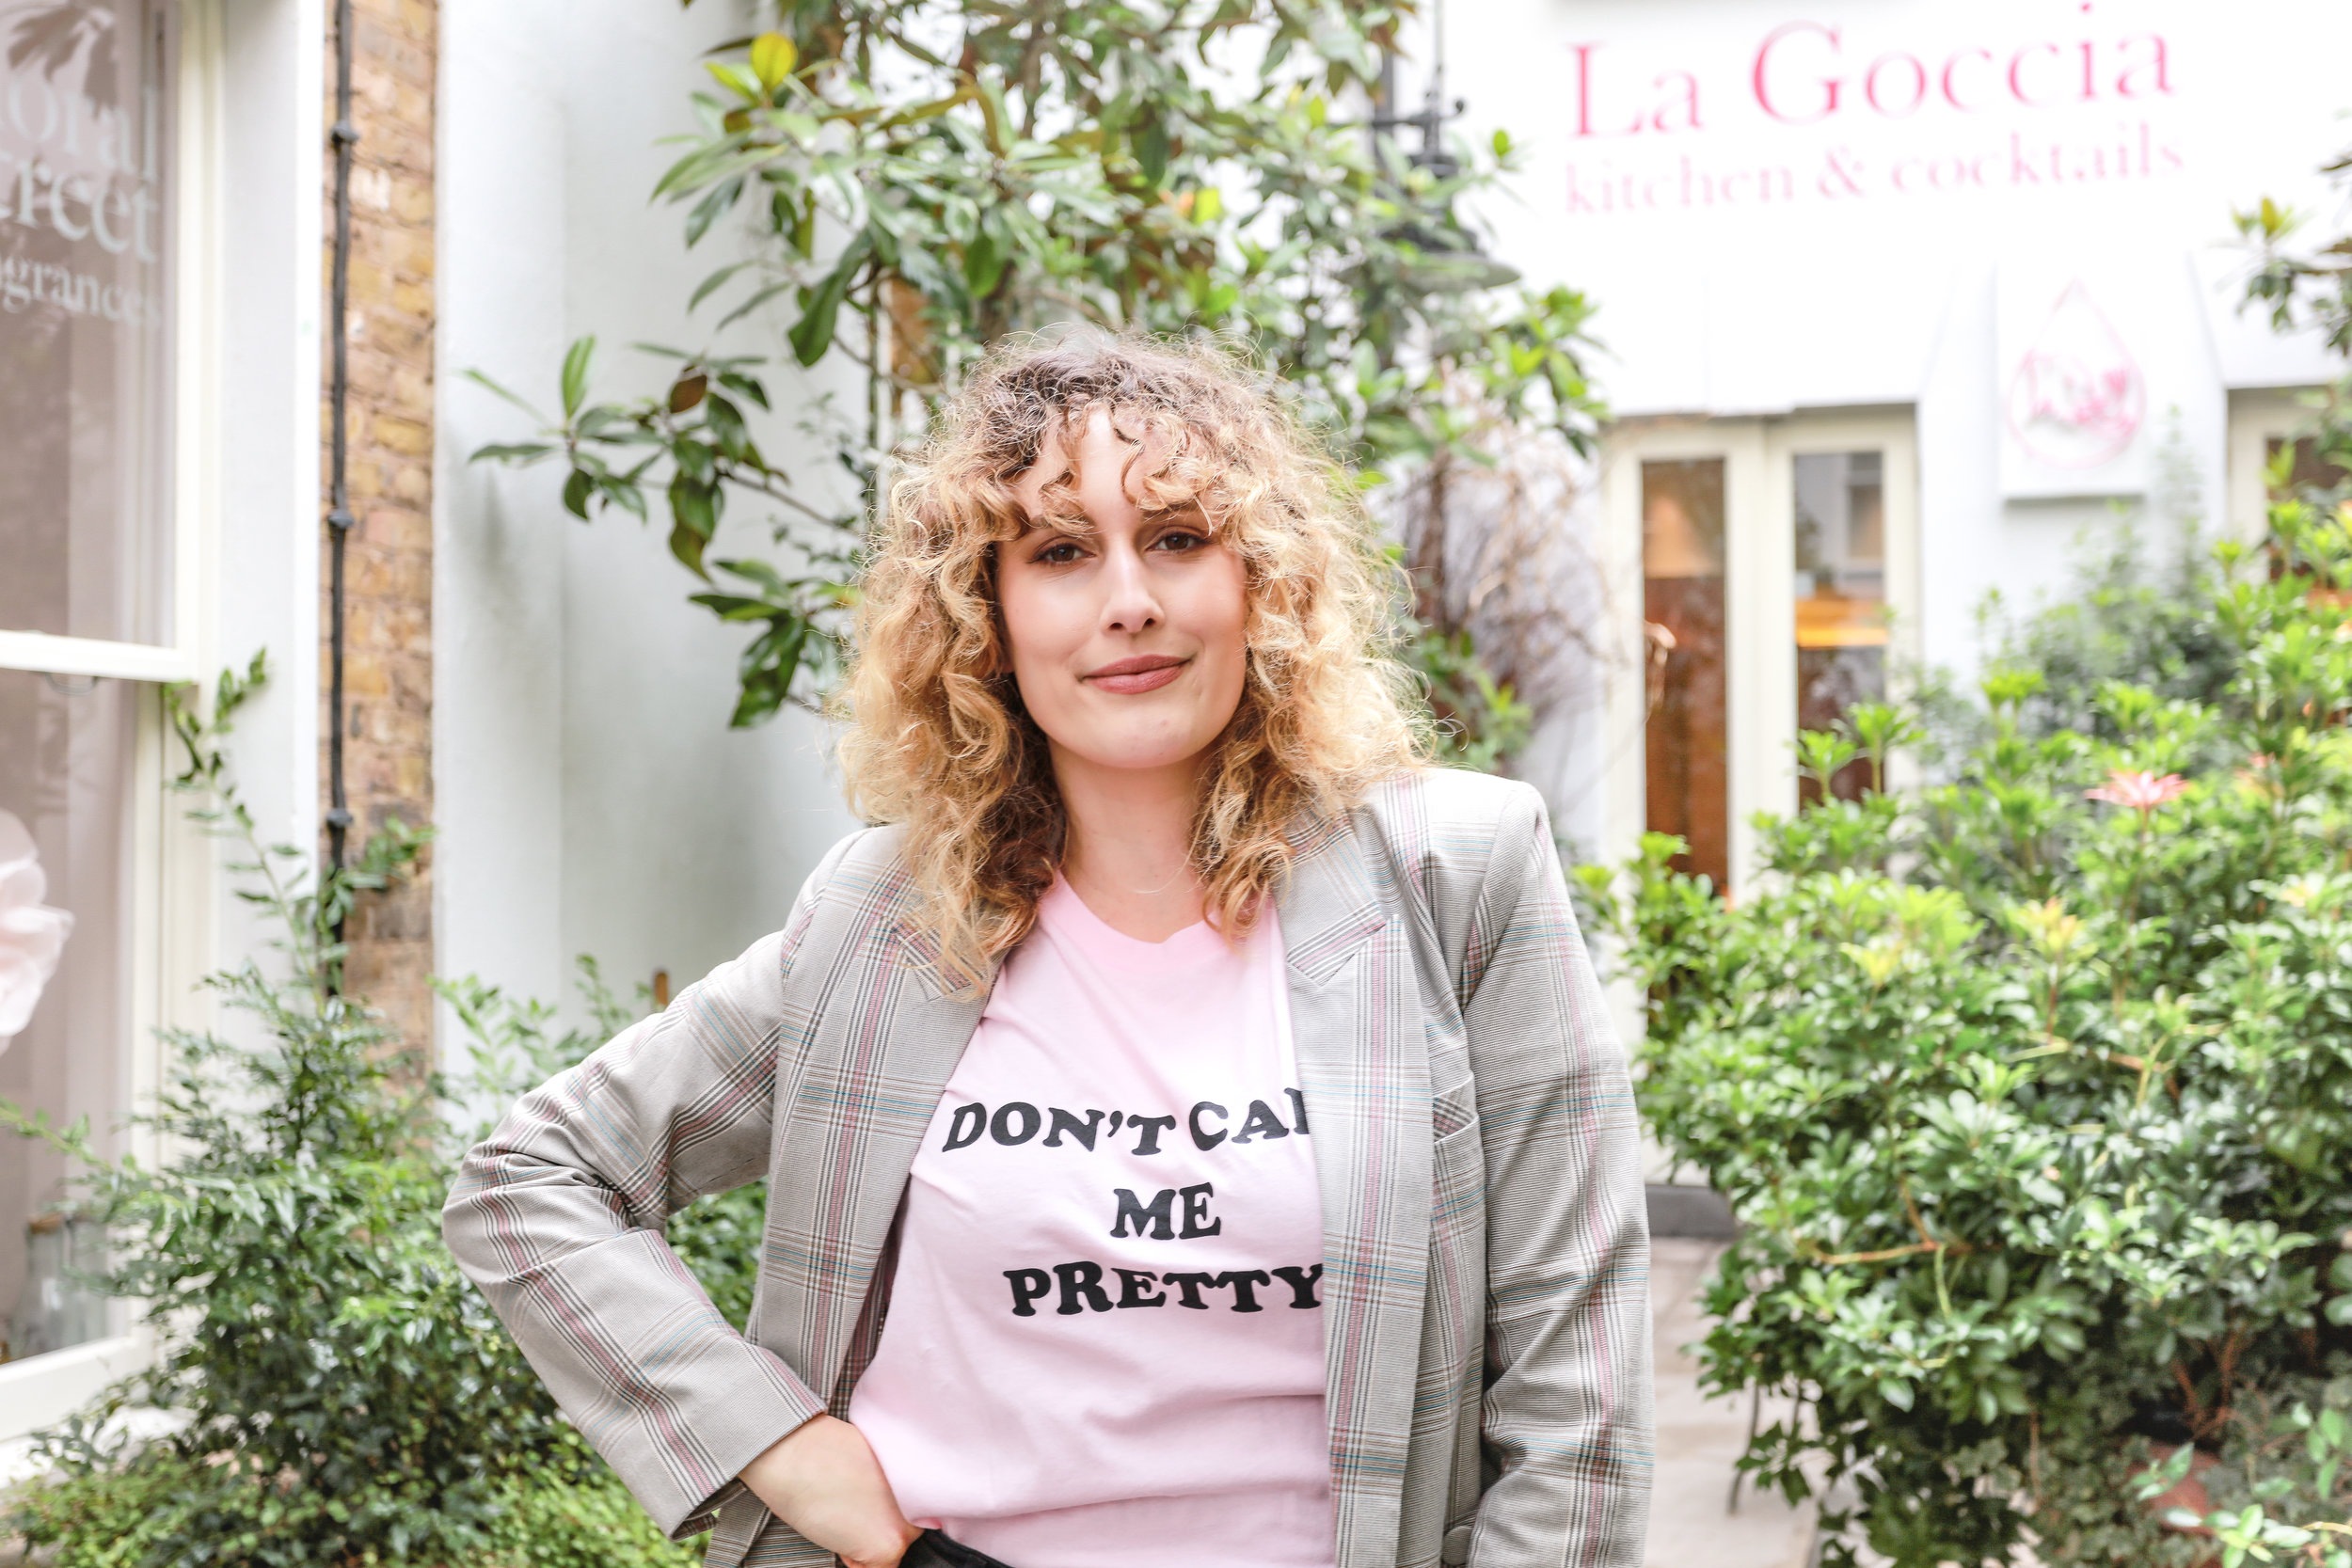 Aly Nagel - Dont Call Me Pretty - London Sept 2019 - Laura Rose Creative (31).jpg